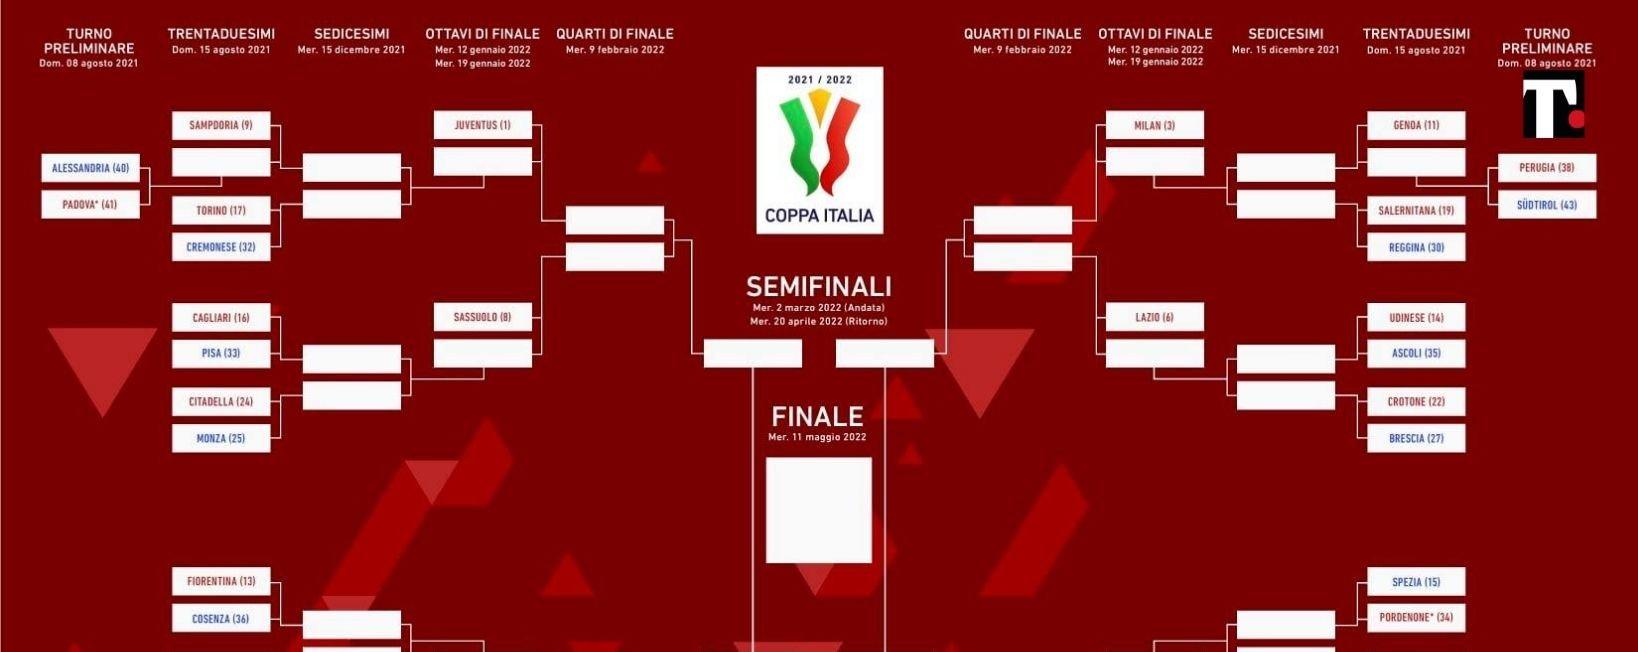 Coppa Italia 21-22, dove vederla